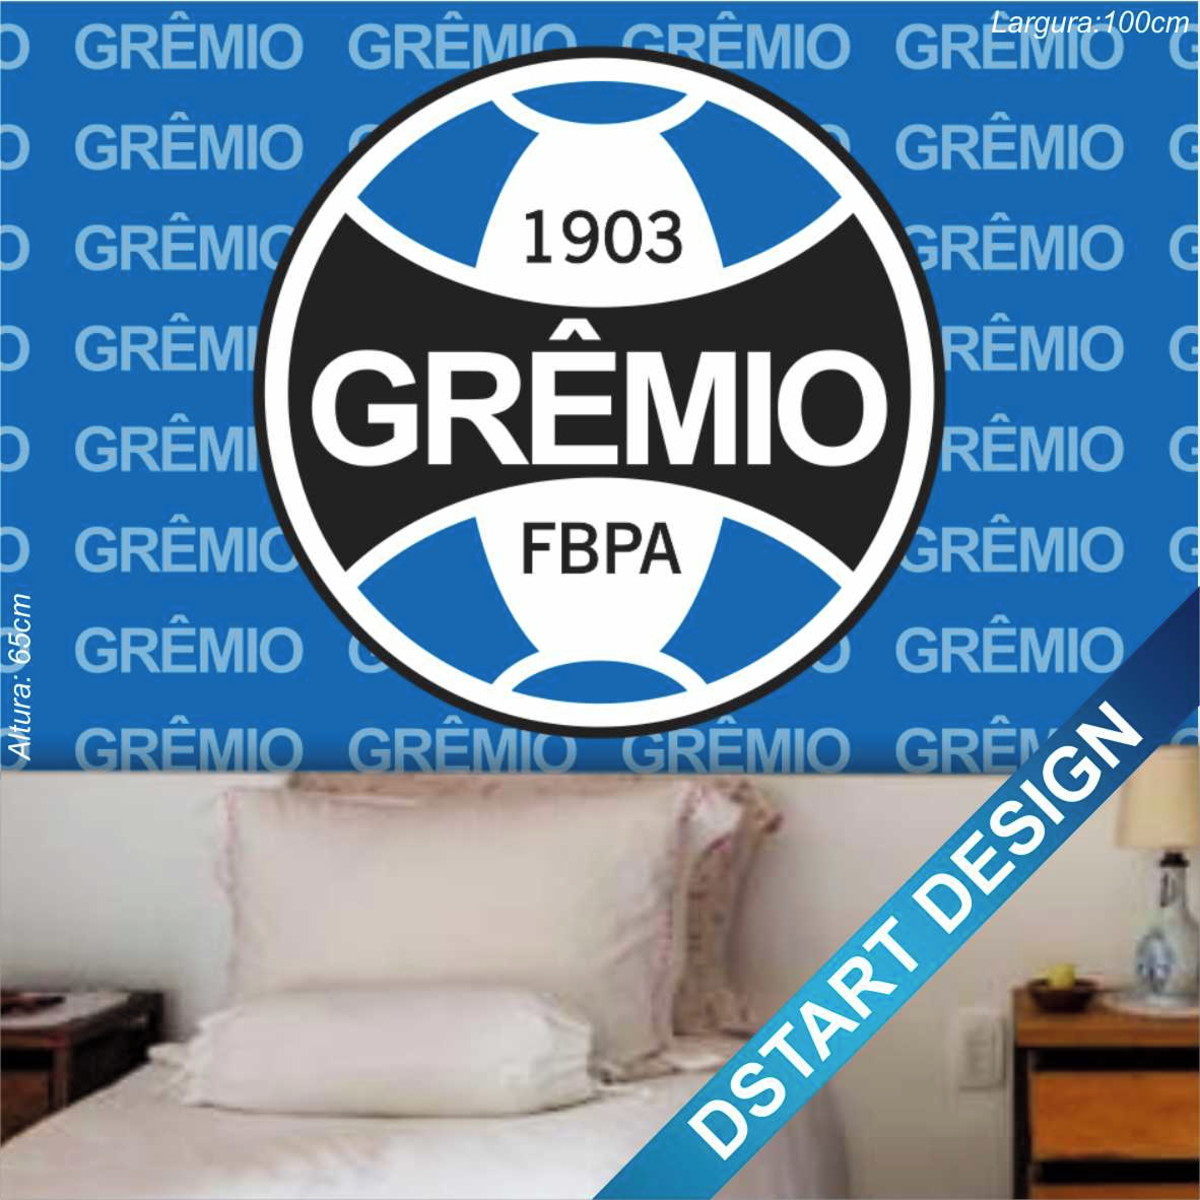 Adesivo Vinil Impresso 100x65cm Time Futebol Grêmio Mod.1 no Elo7 ... c89a675ca7565